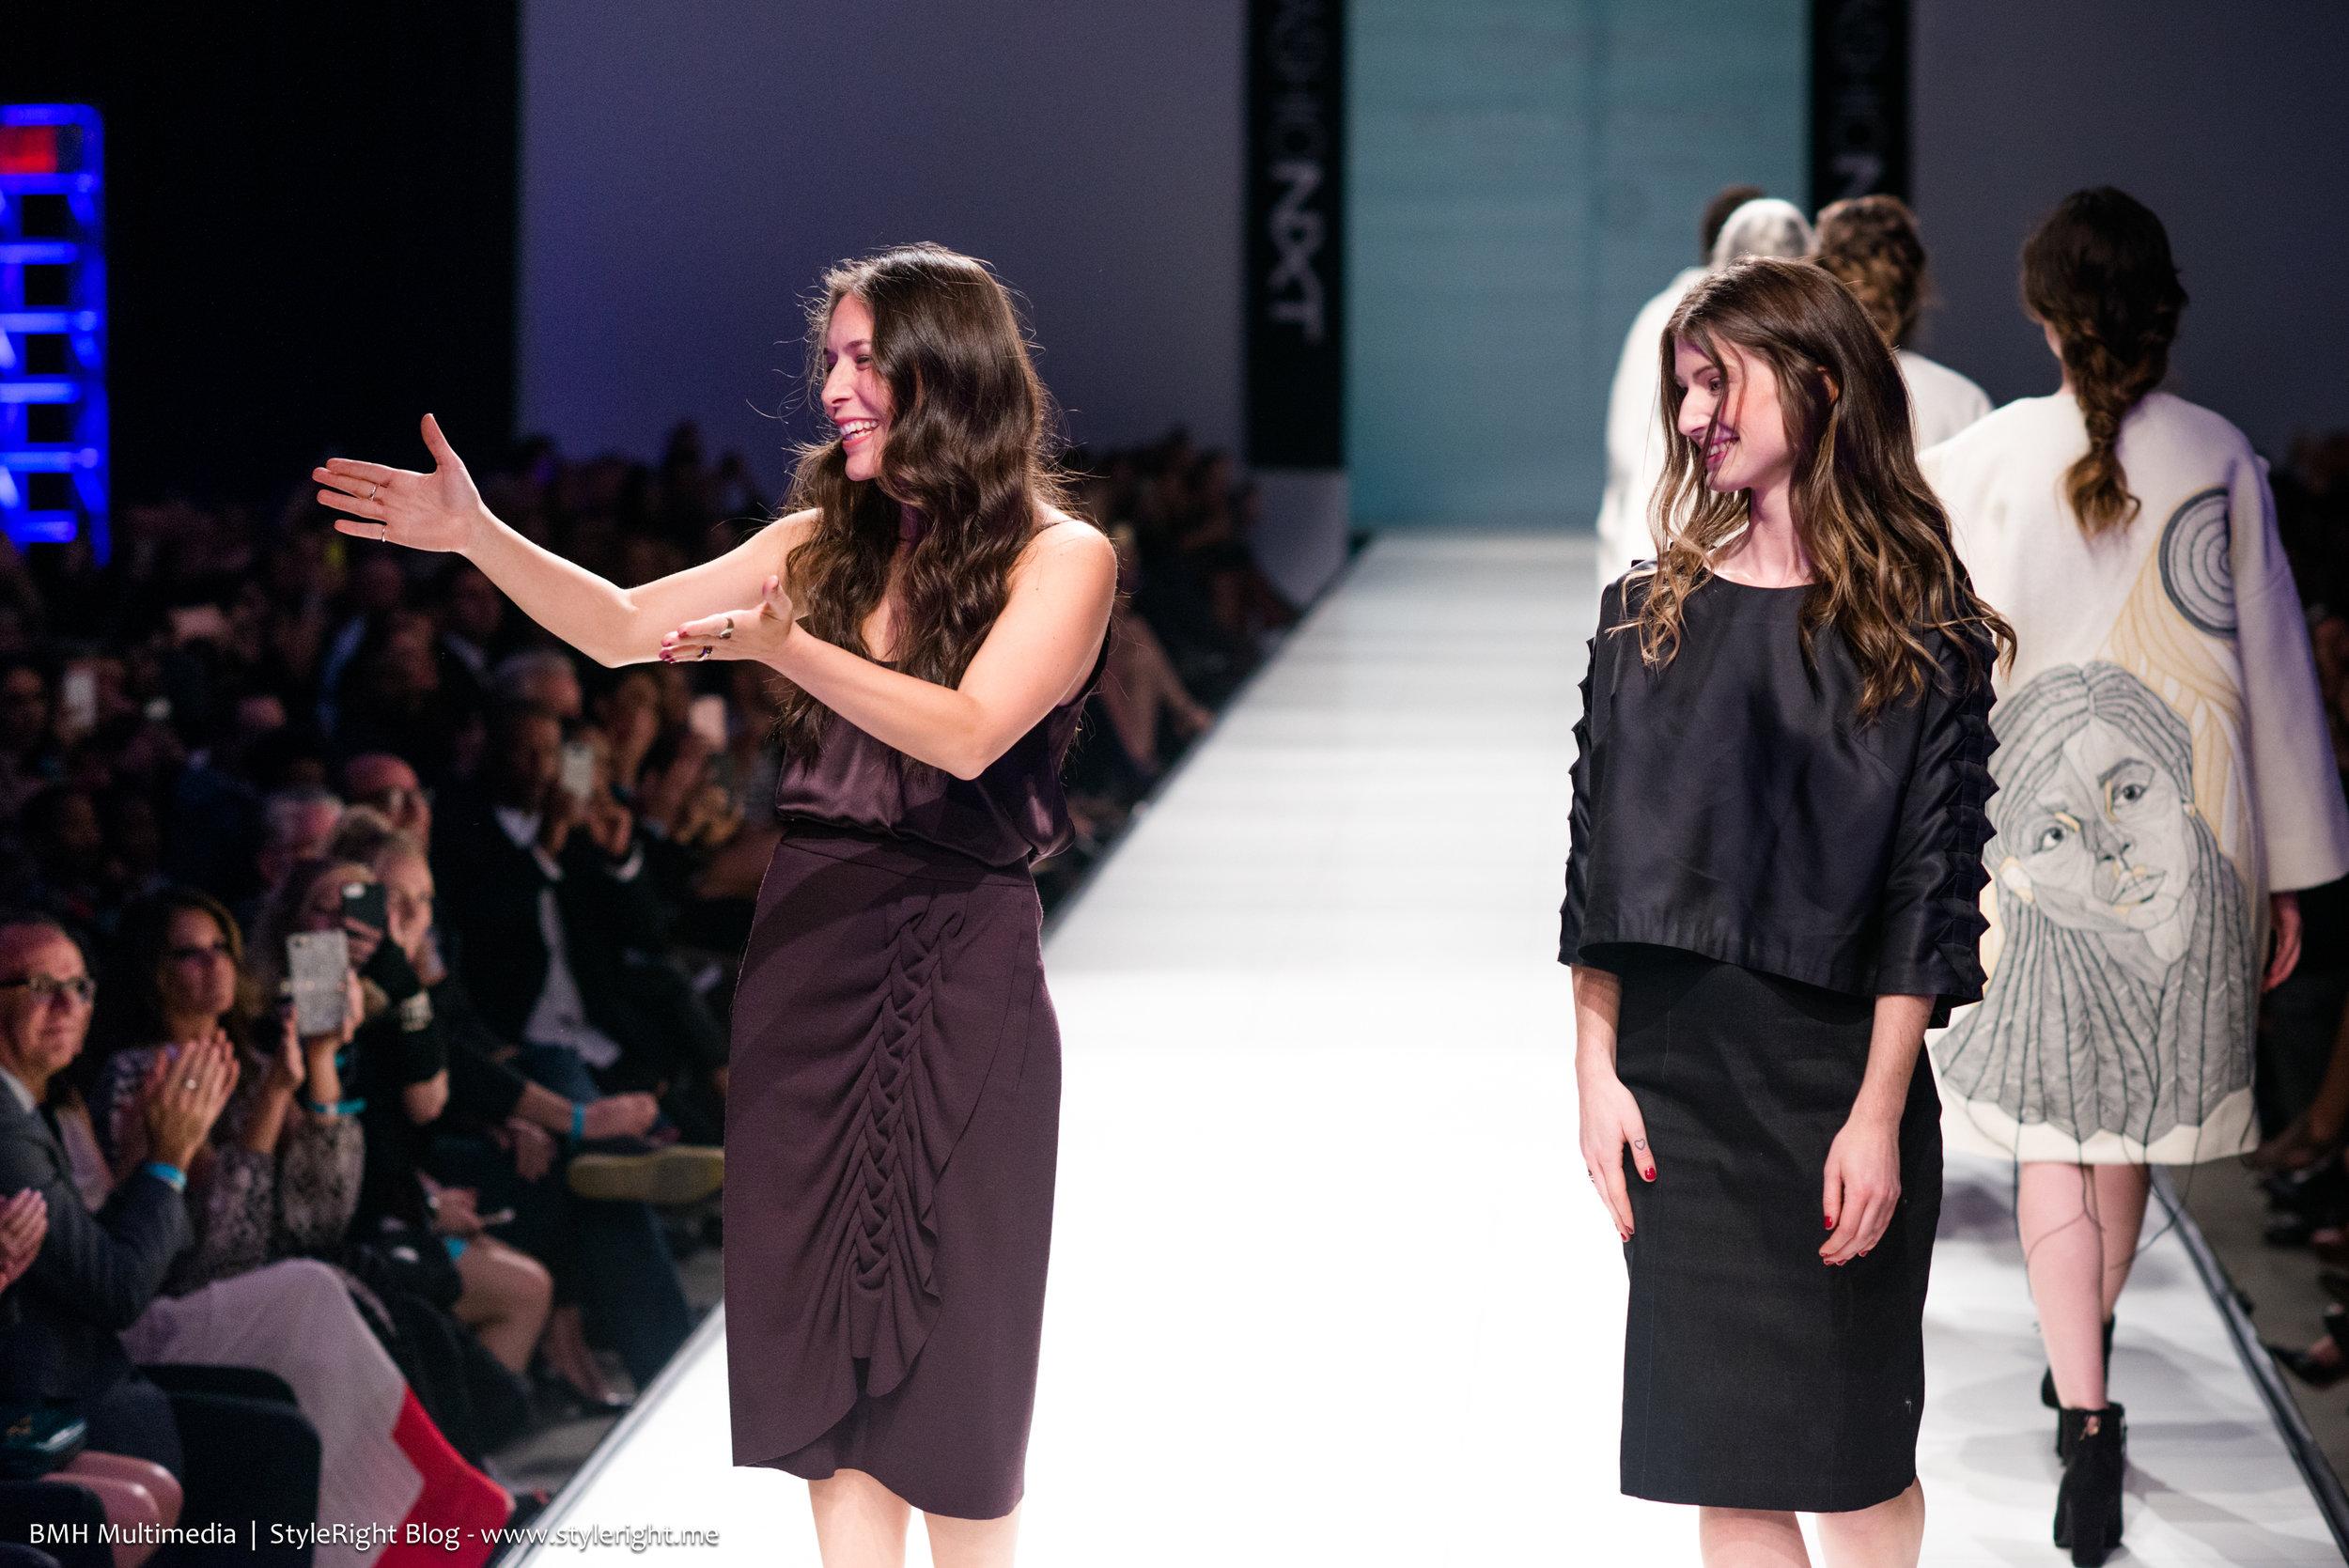 2017-fashionxt-night-2-7026.jpg